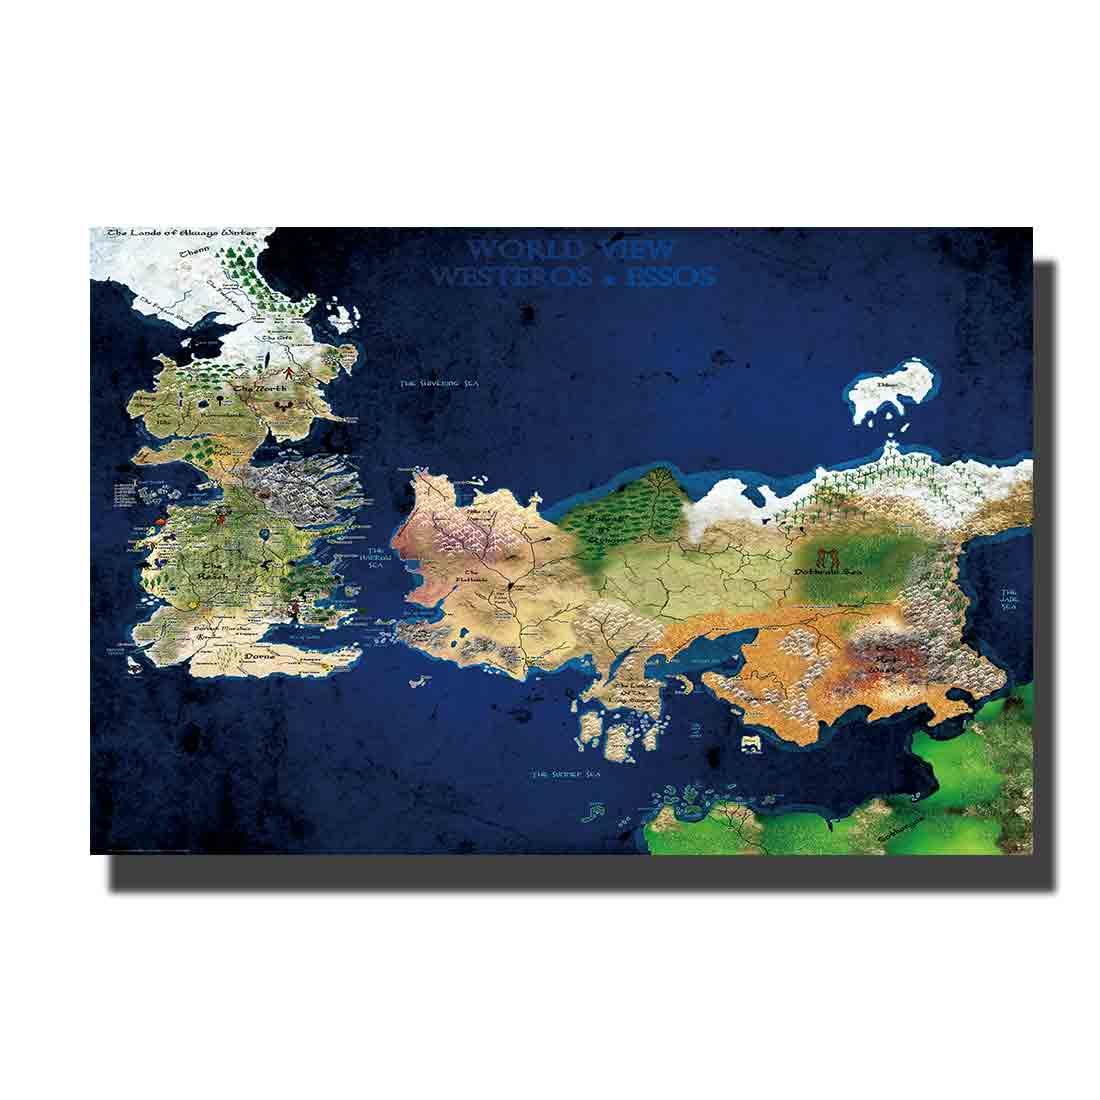 game of thrones westeros essos map